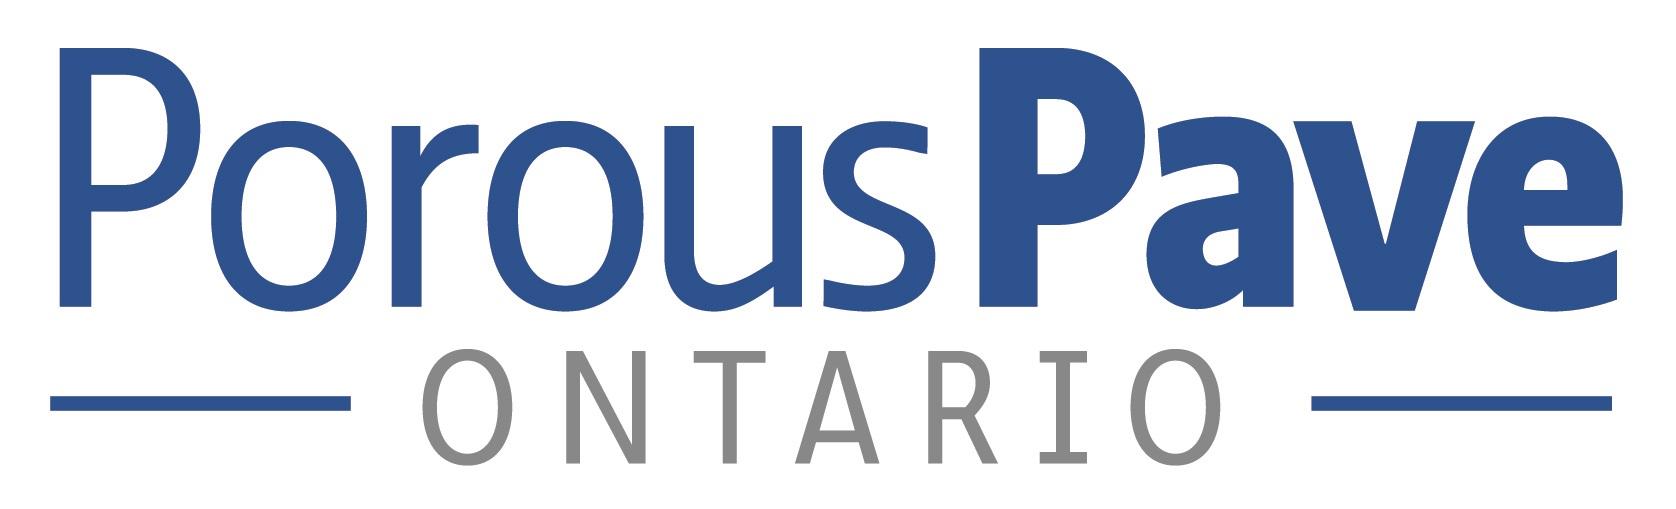 Porous Pave Ontario